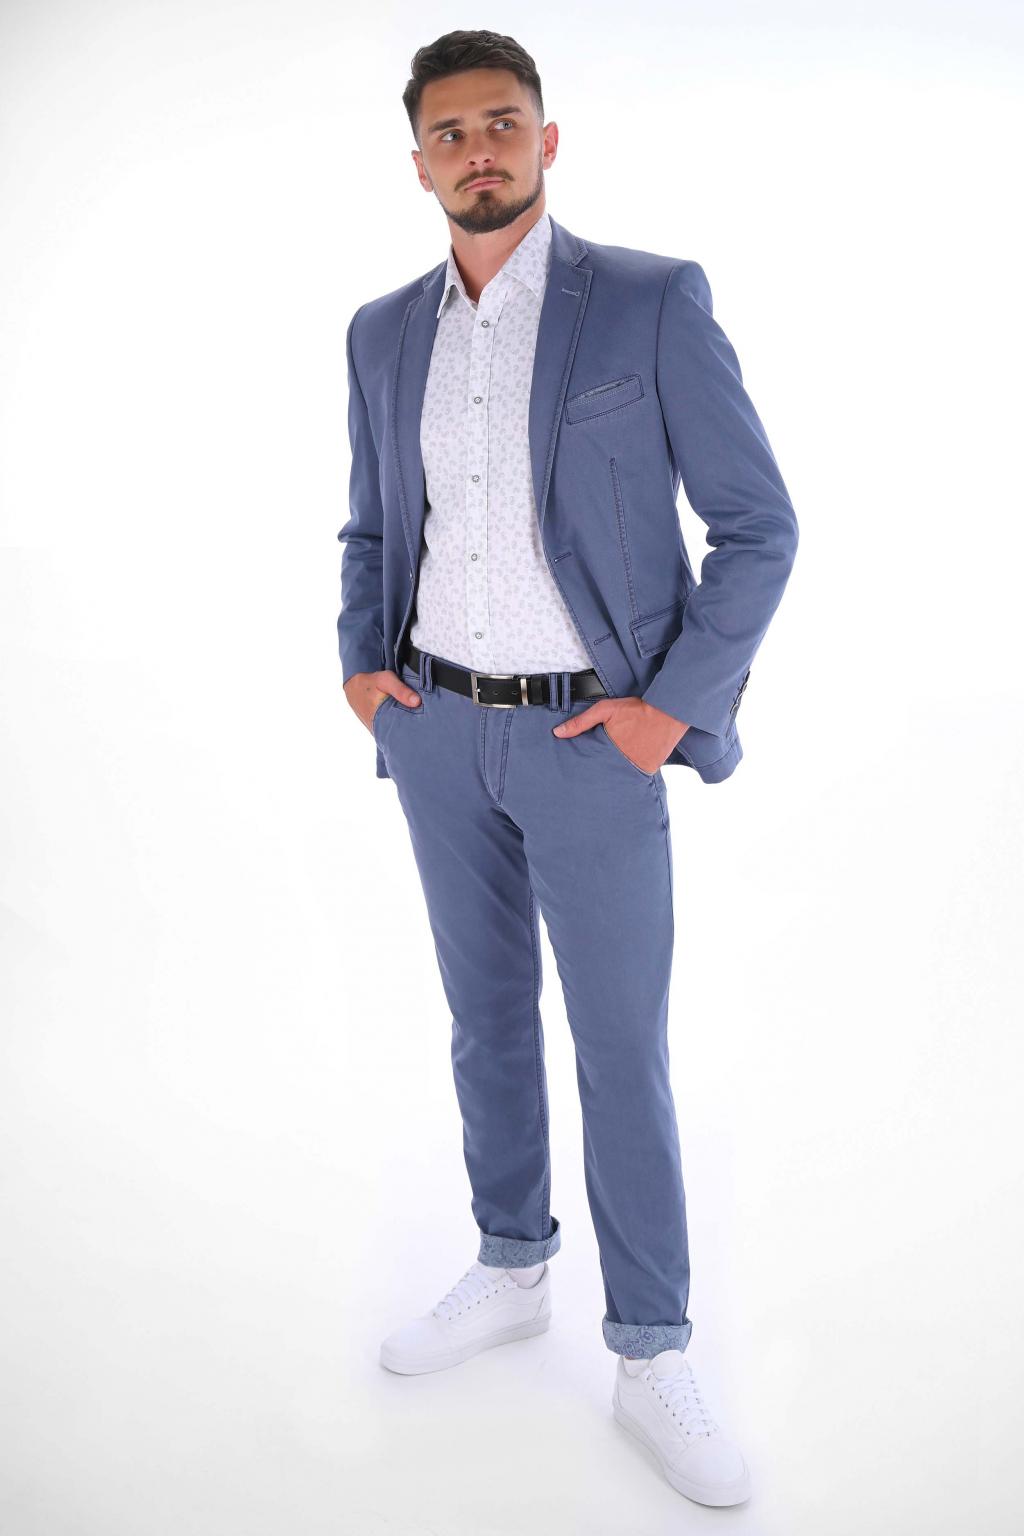 Modrosivé nohavice Chinos  ULTRA SLIM strih, bavlna stretch